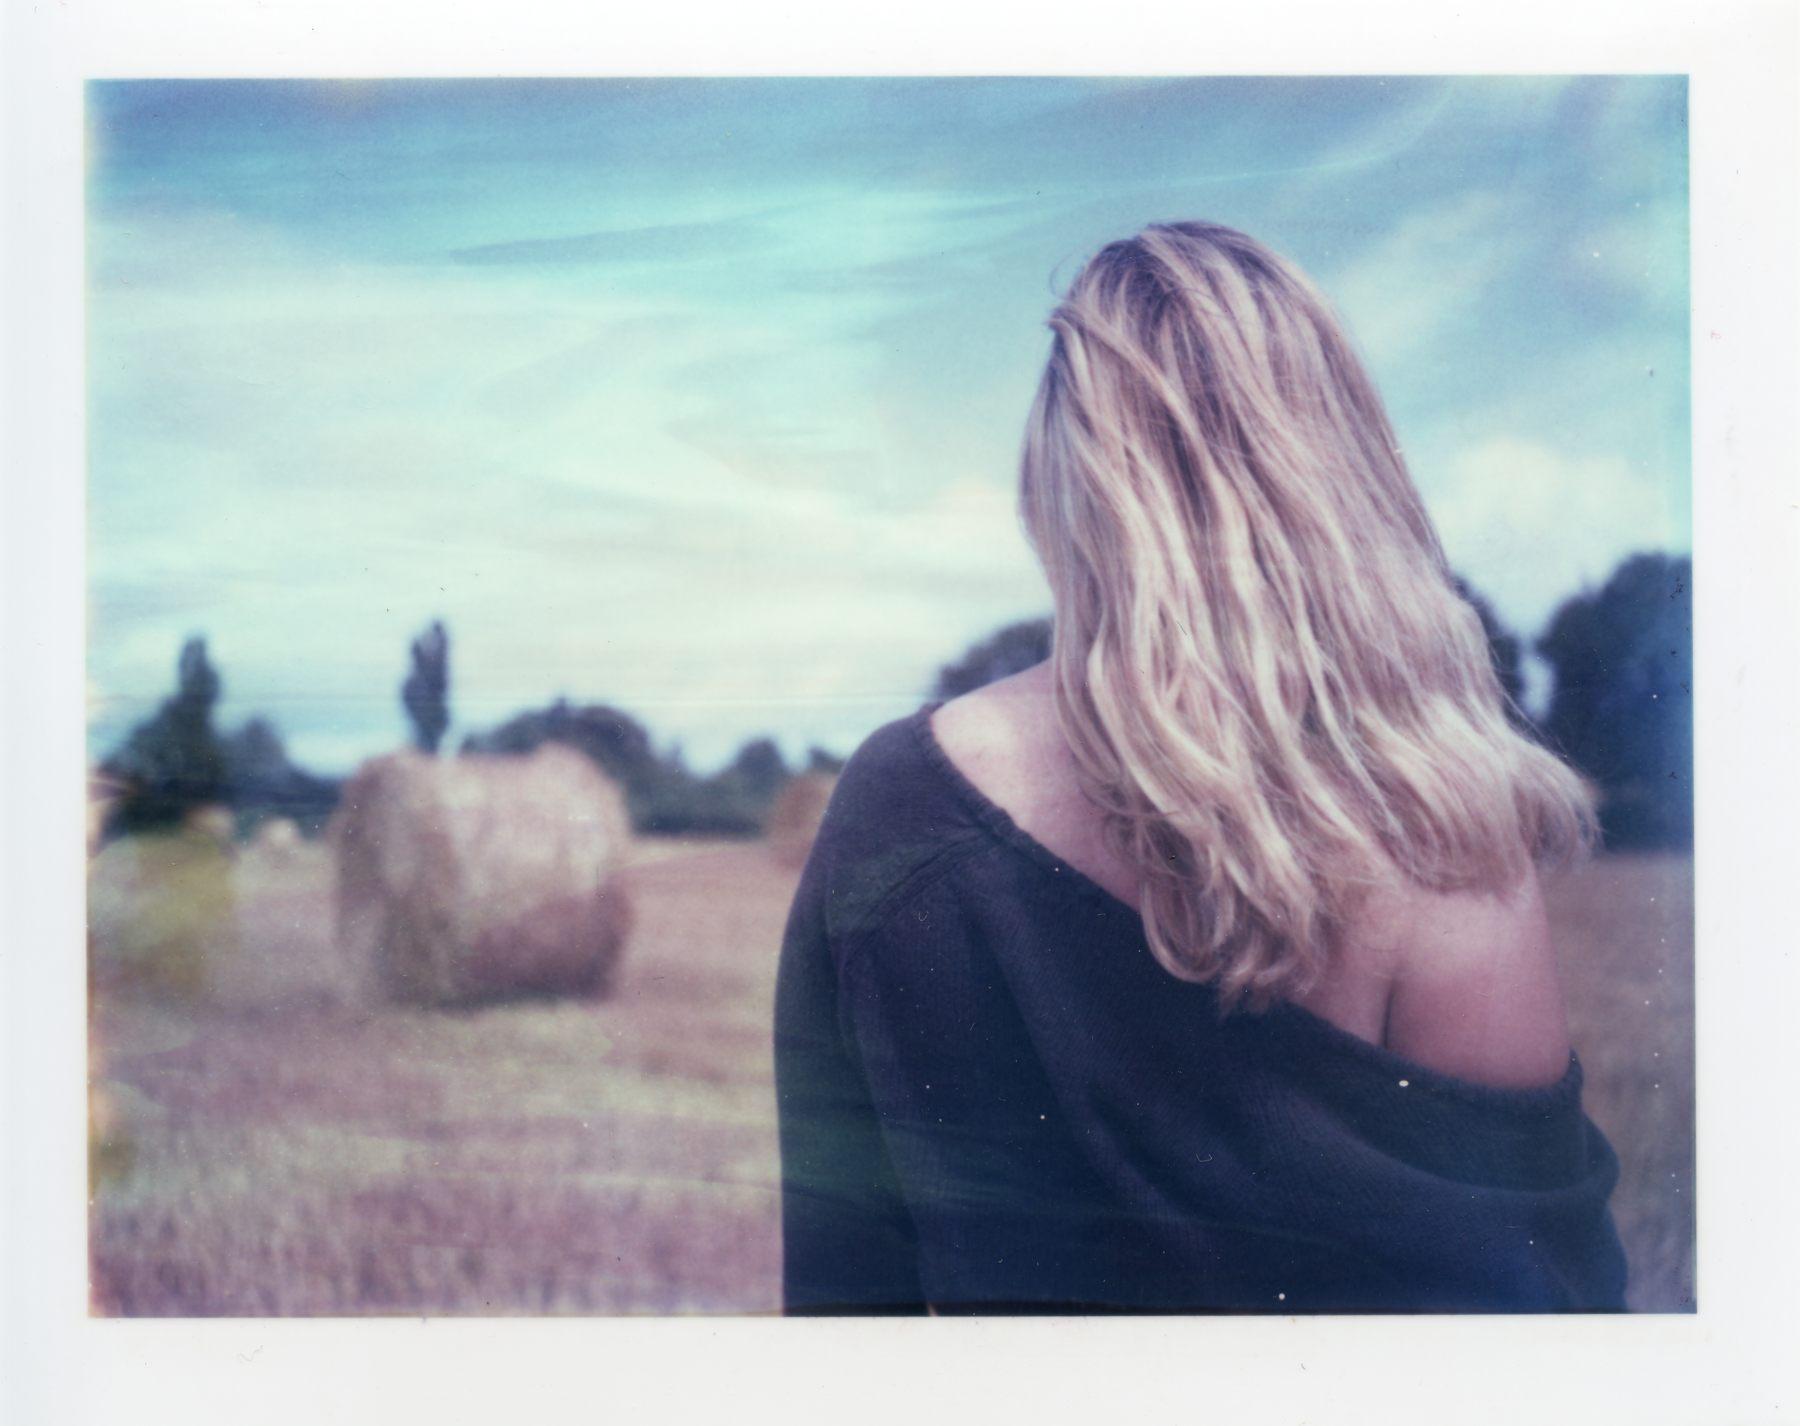 Rock & Roll | Polaroid Land 340 | Laurent Fouchet